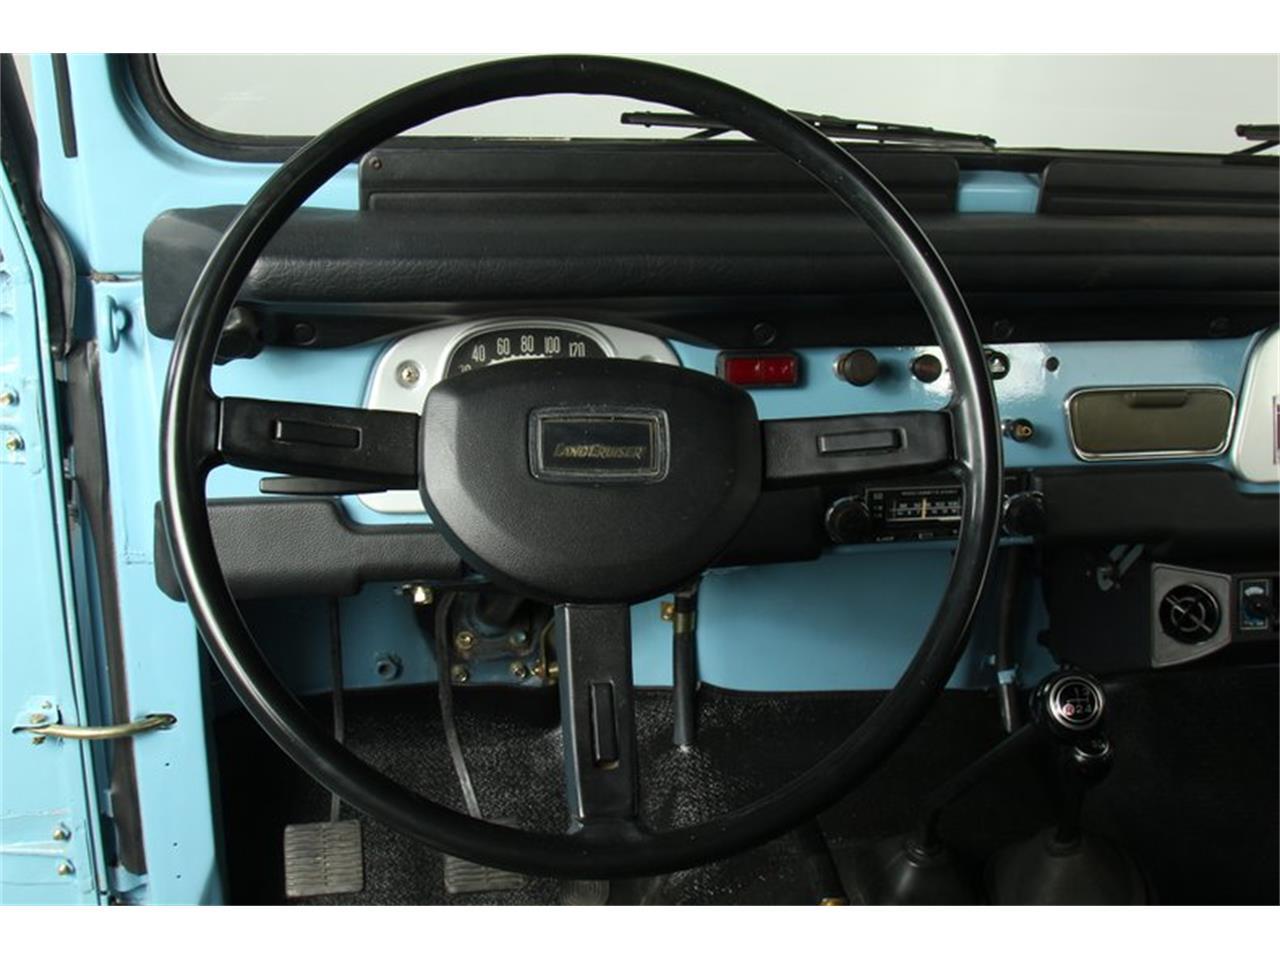 1982 Toyota Land Cruiser FJ40 (CC-1250389) for sale in Elyria, Ohio